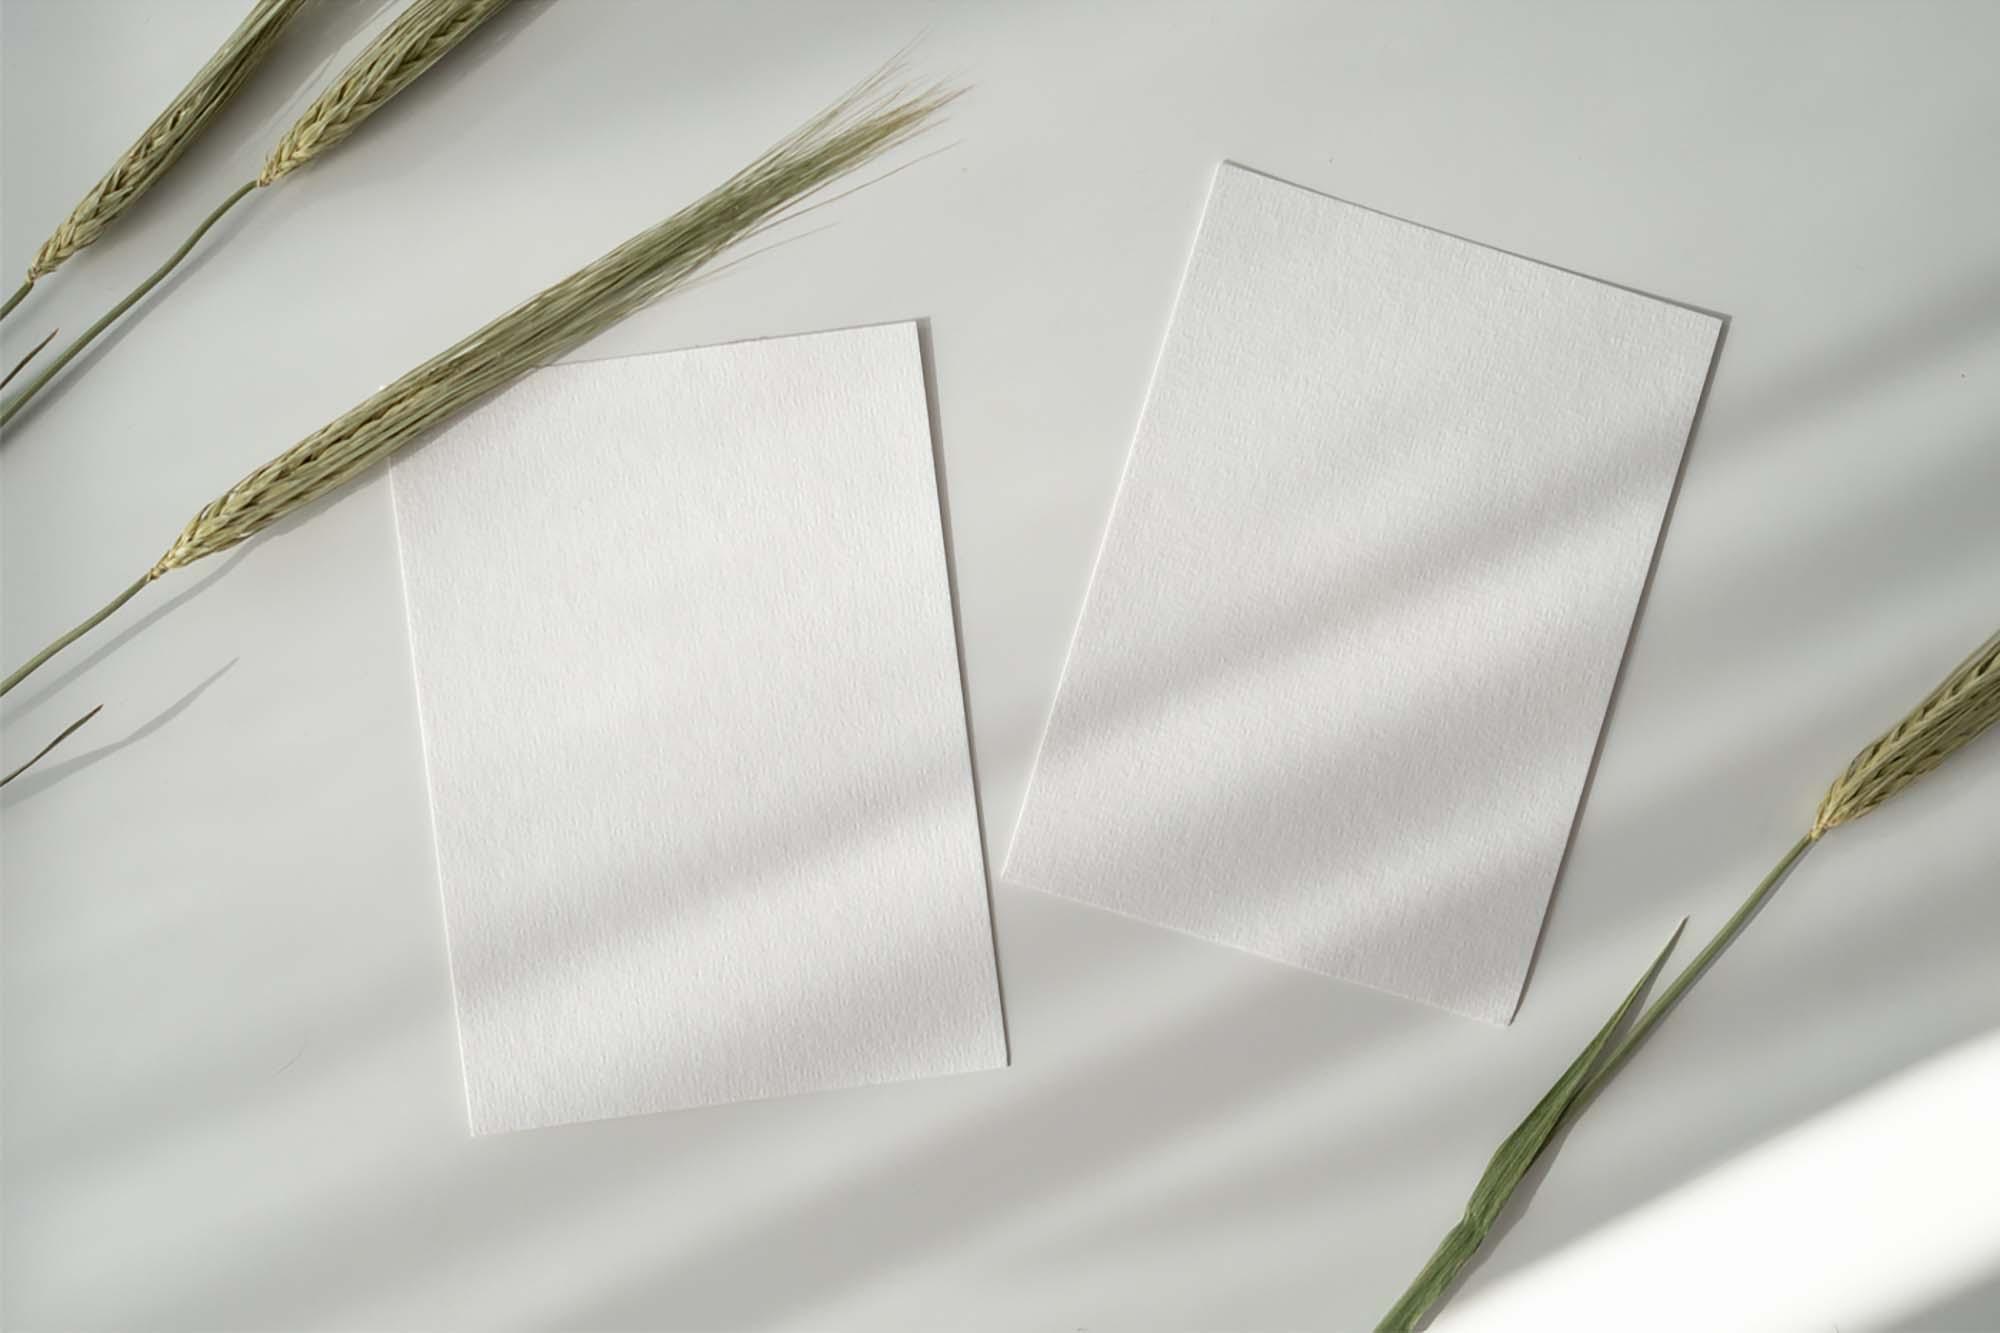 2 Cards Mockup 2